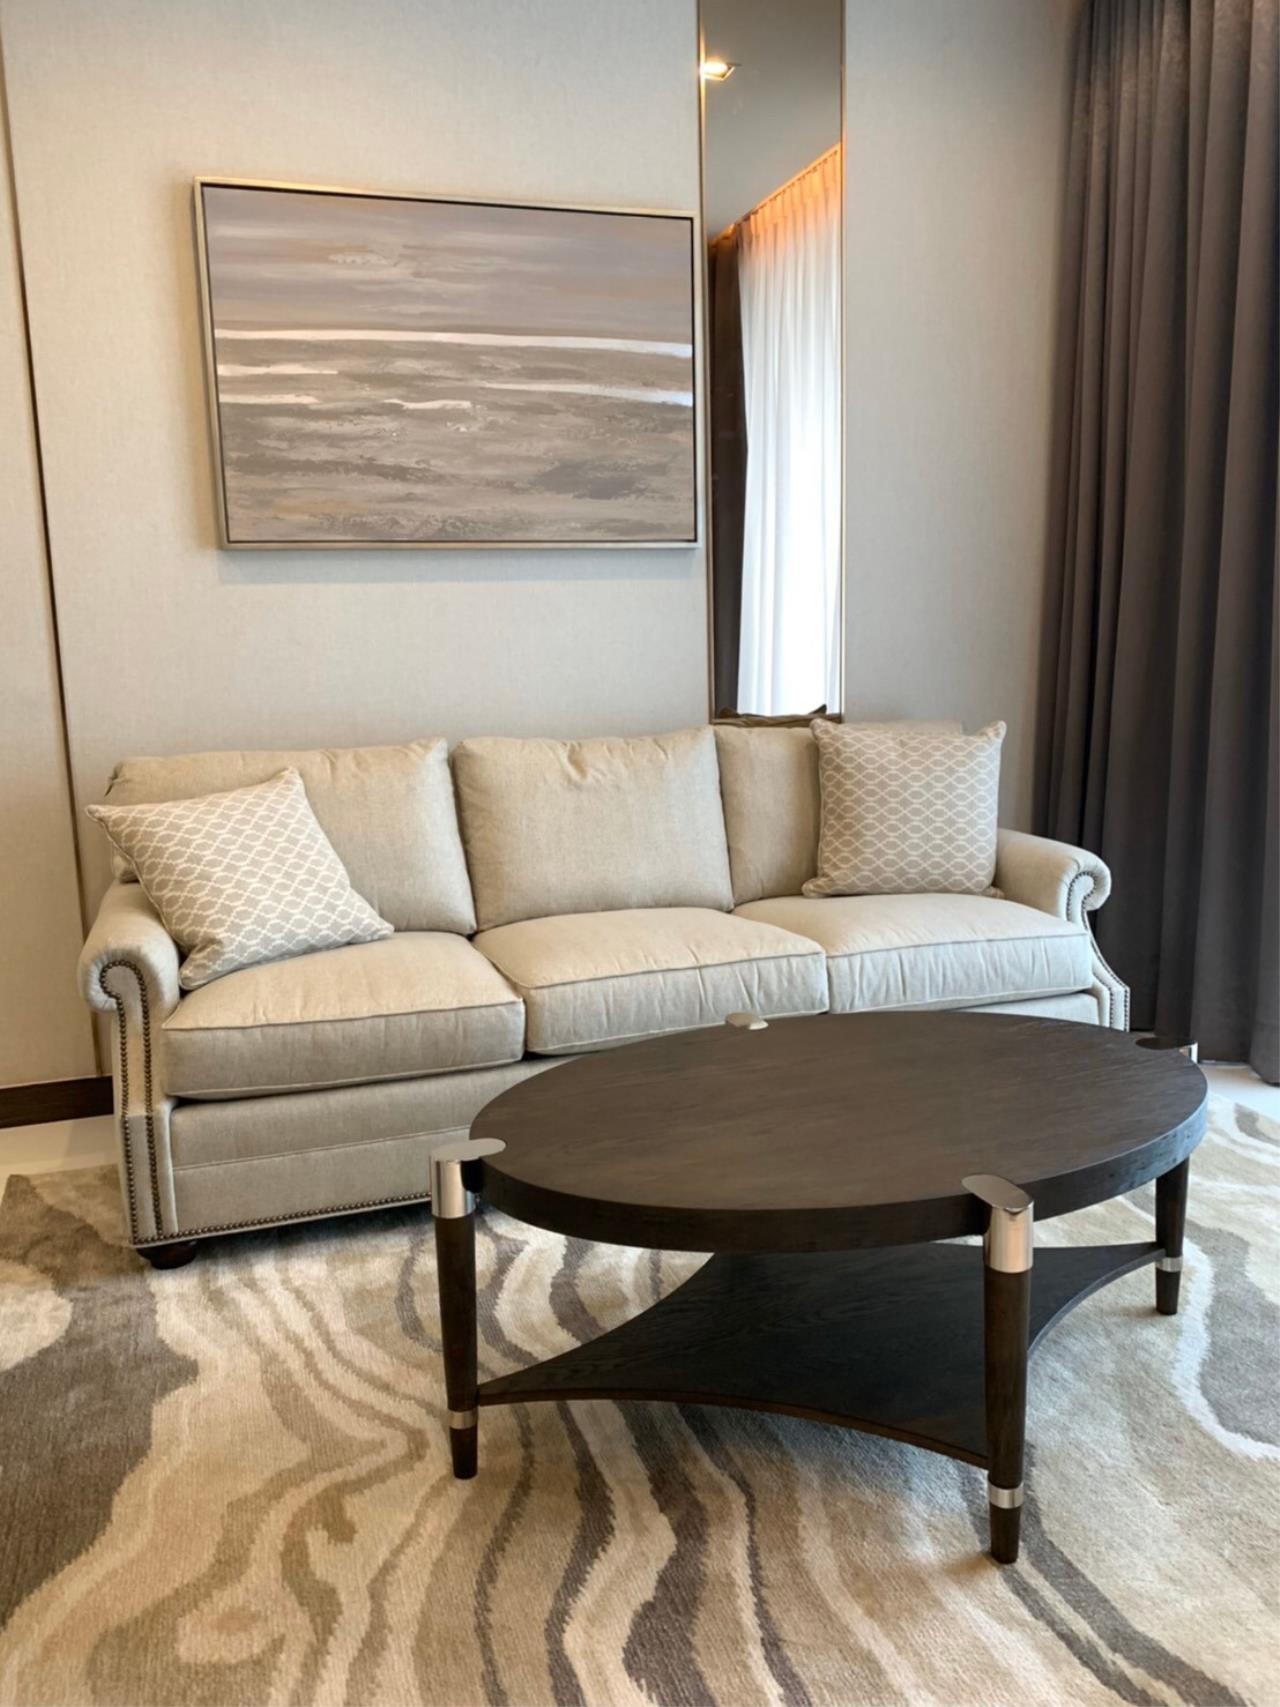 Bestbkkcondos Agency's Q sukhumvit at BTSnana - 92sqm - For Rent : 90 000 / month - 2 Bedrooms 11